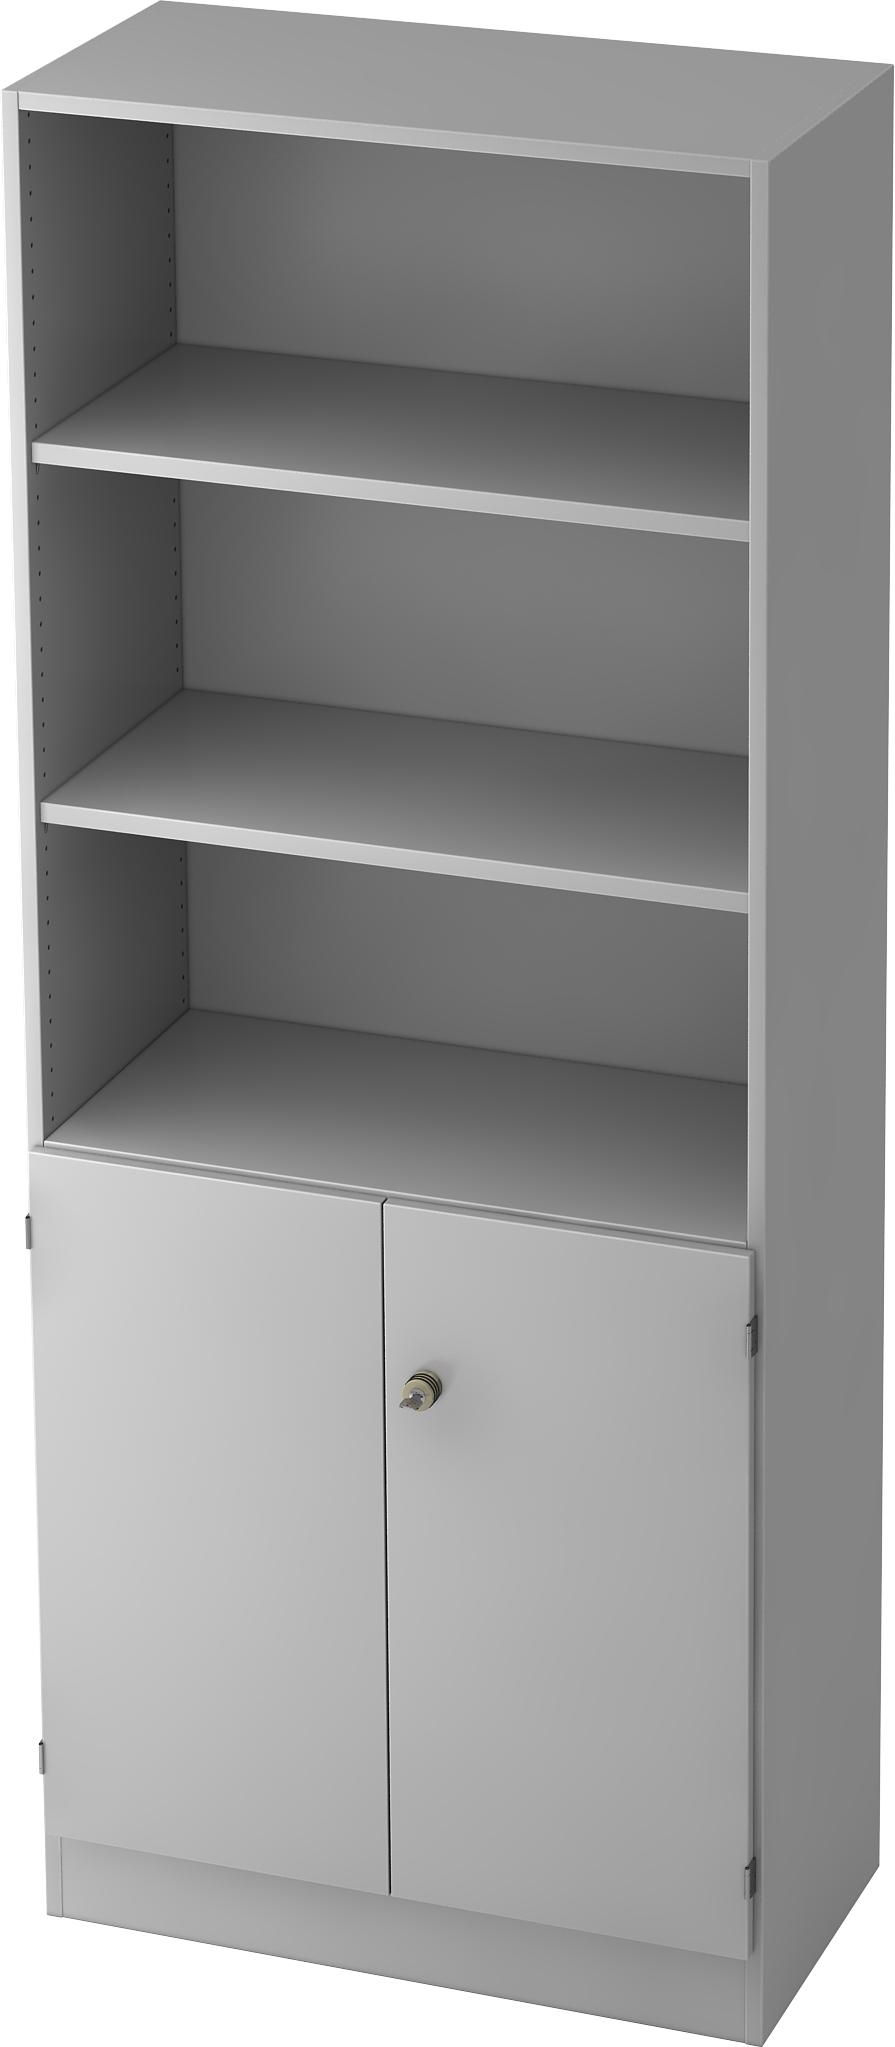 aktenschrank b roschrank regalschrank abschlie bar holz. Black Bedroom Furniture Sets. Home Design Ideas